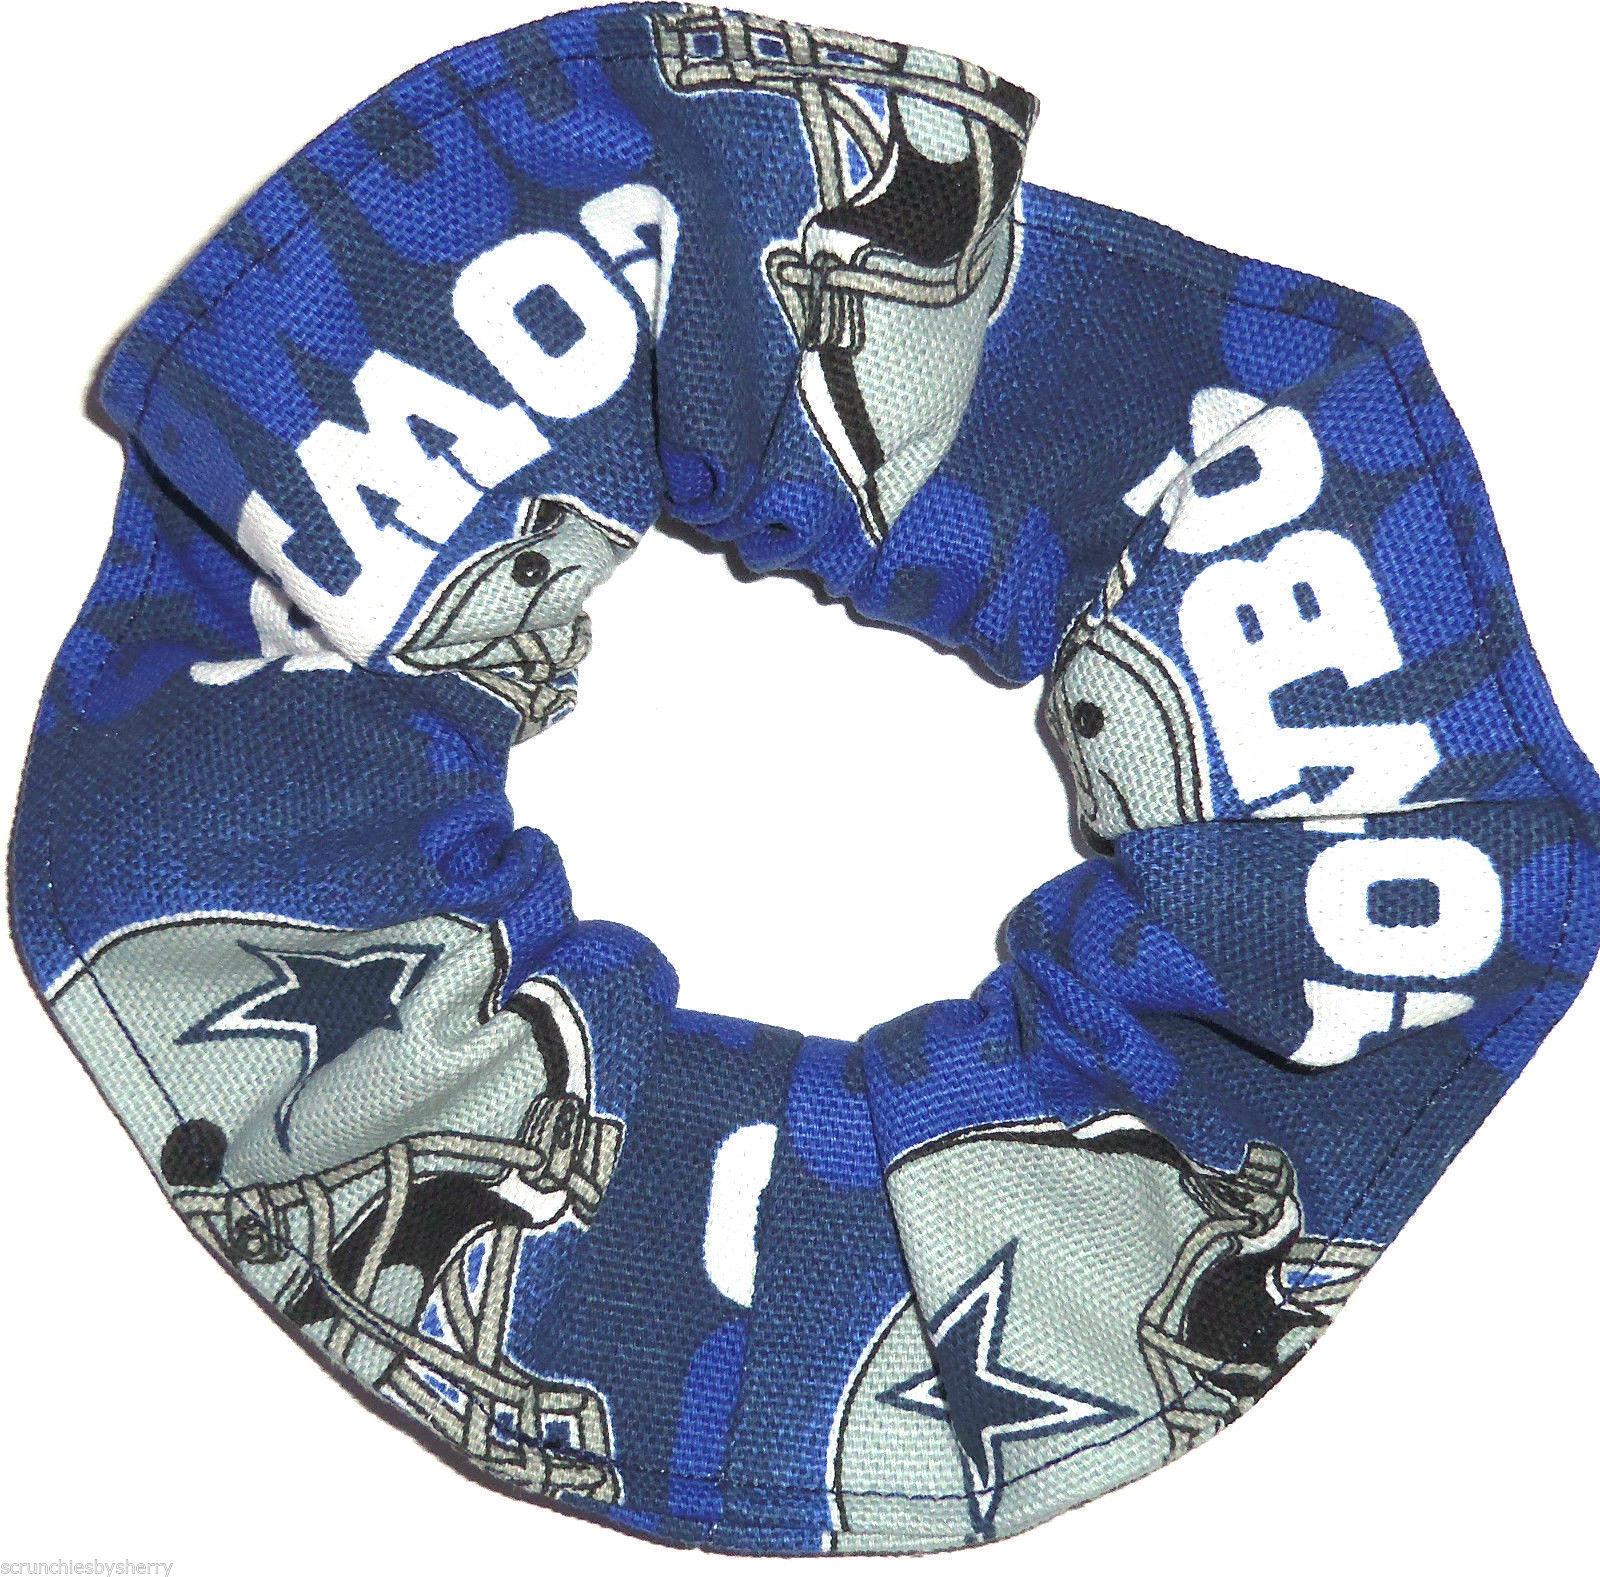 Dallas Cowboys Blue Glow Duck Cloth Fabric Hair Scrunchie Scrunchies by Sherry  - $6.99